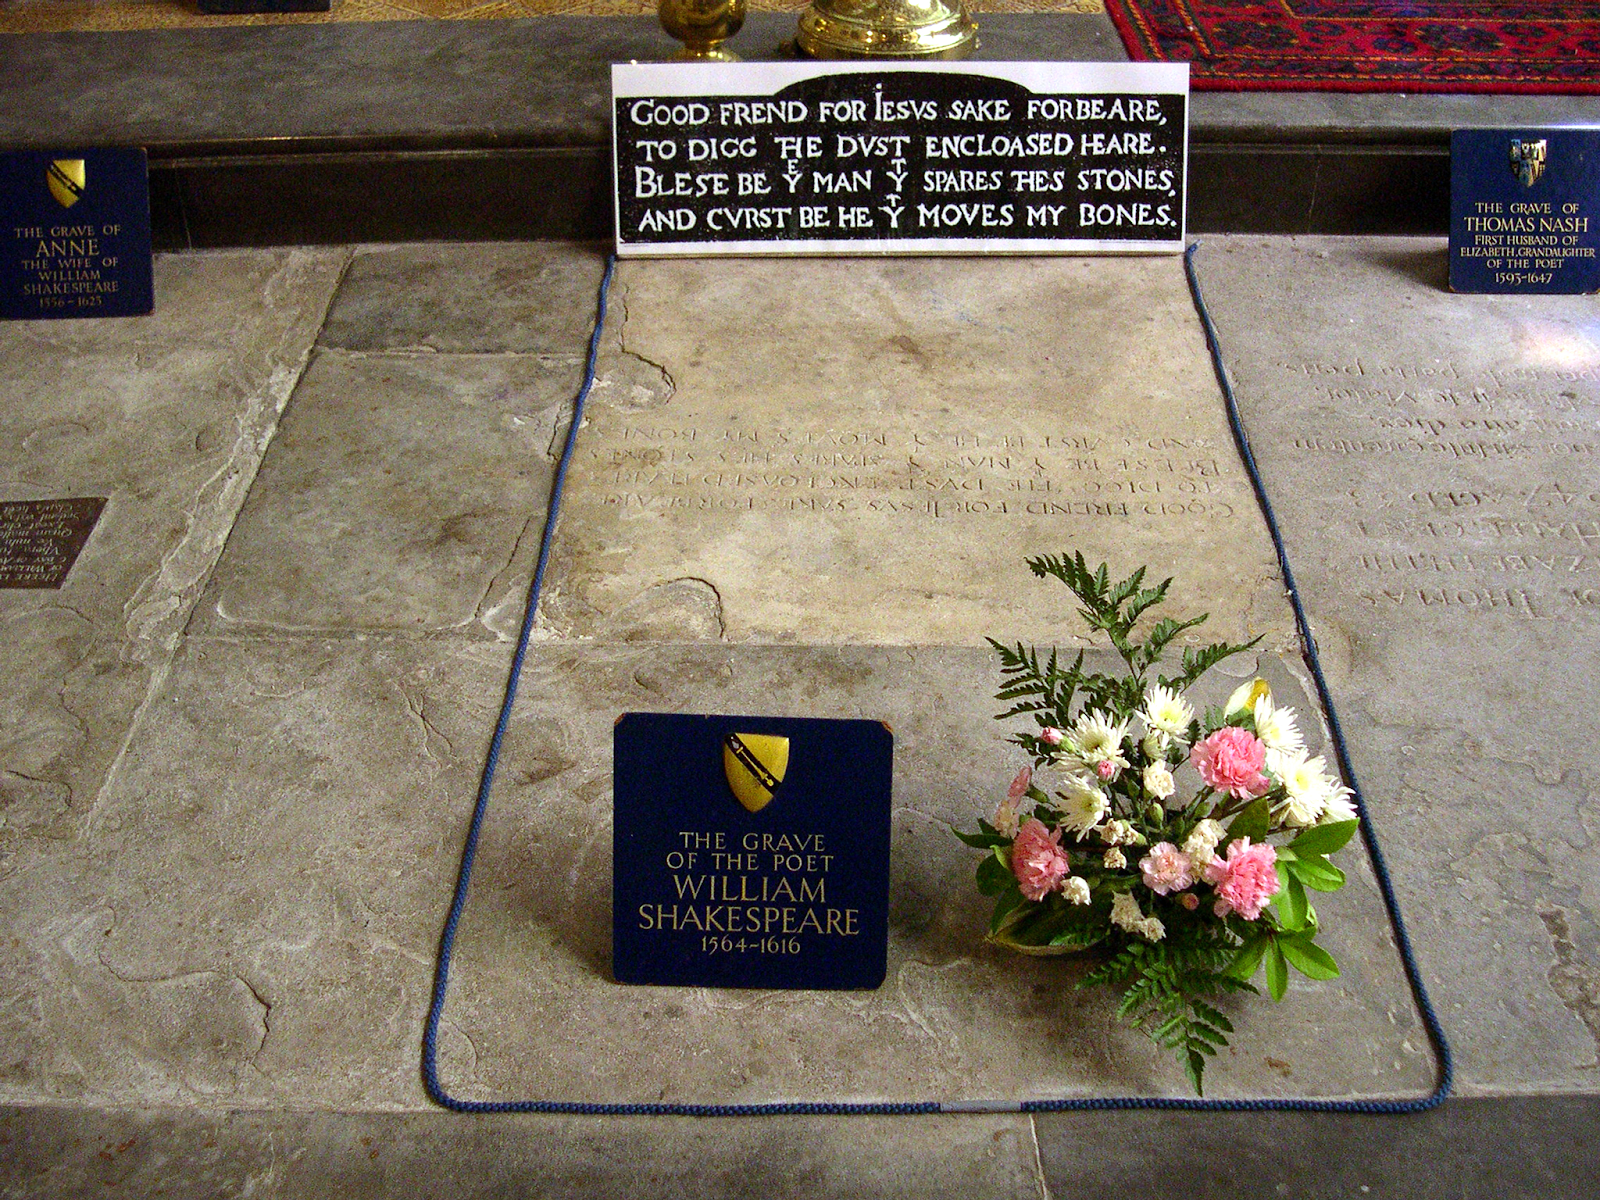 Shakespeare gravestone design